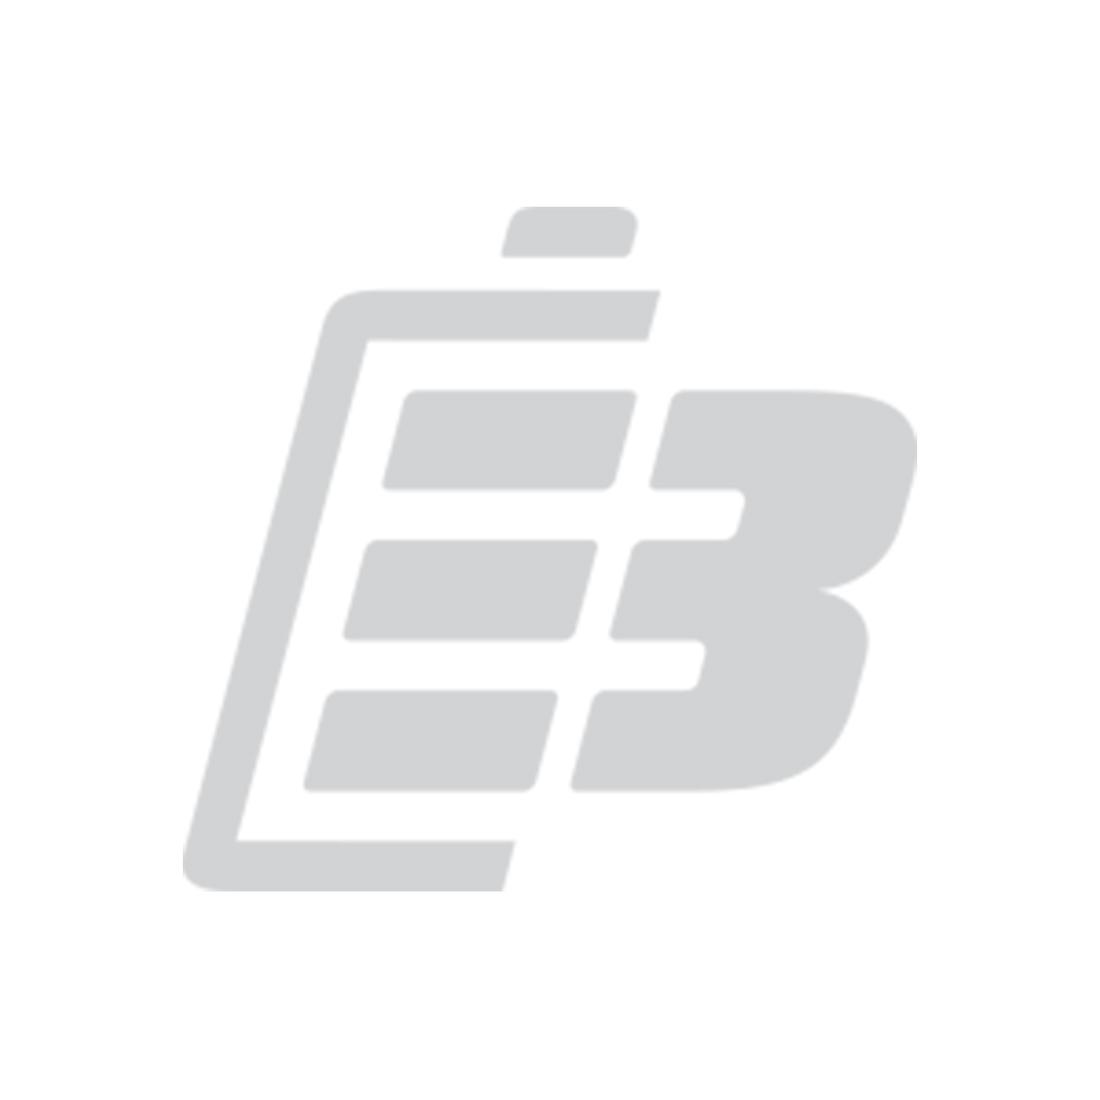 Smartphone battery Microsoft Lumia 950 XL_1